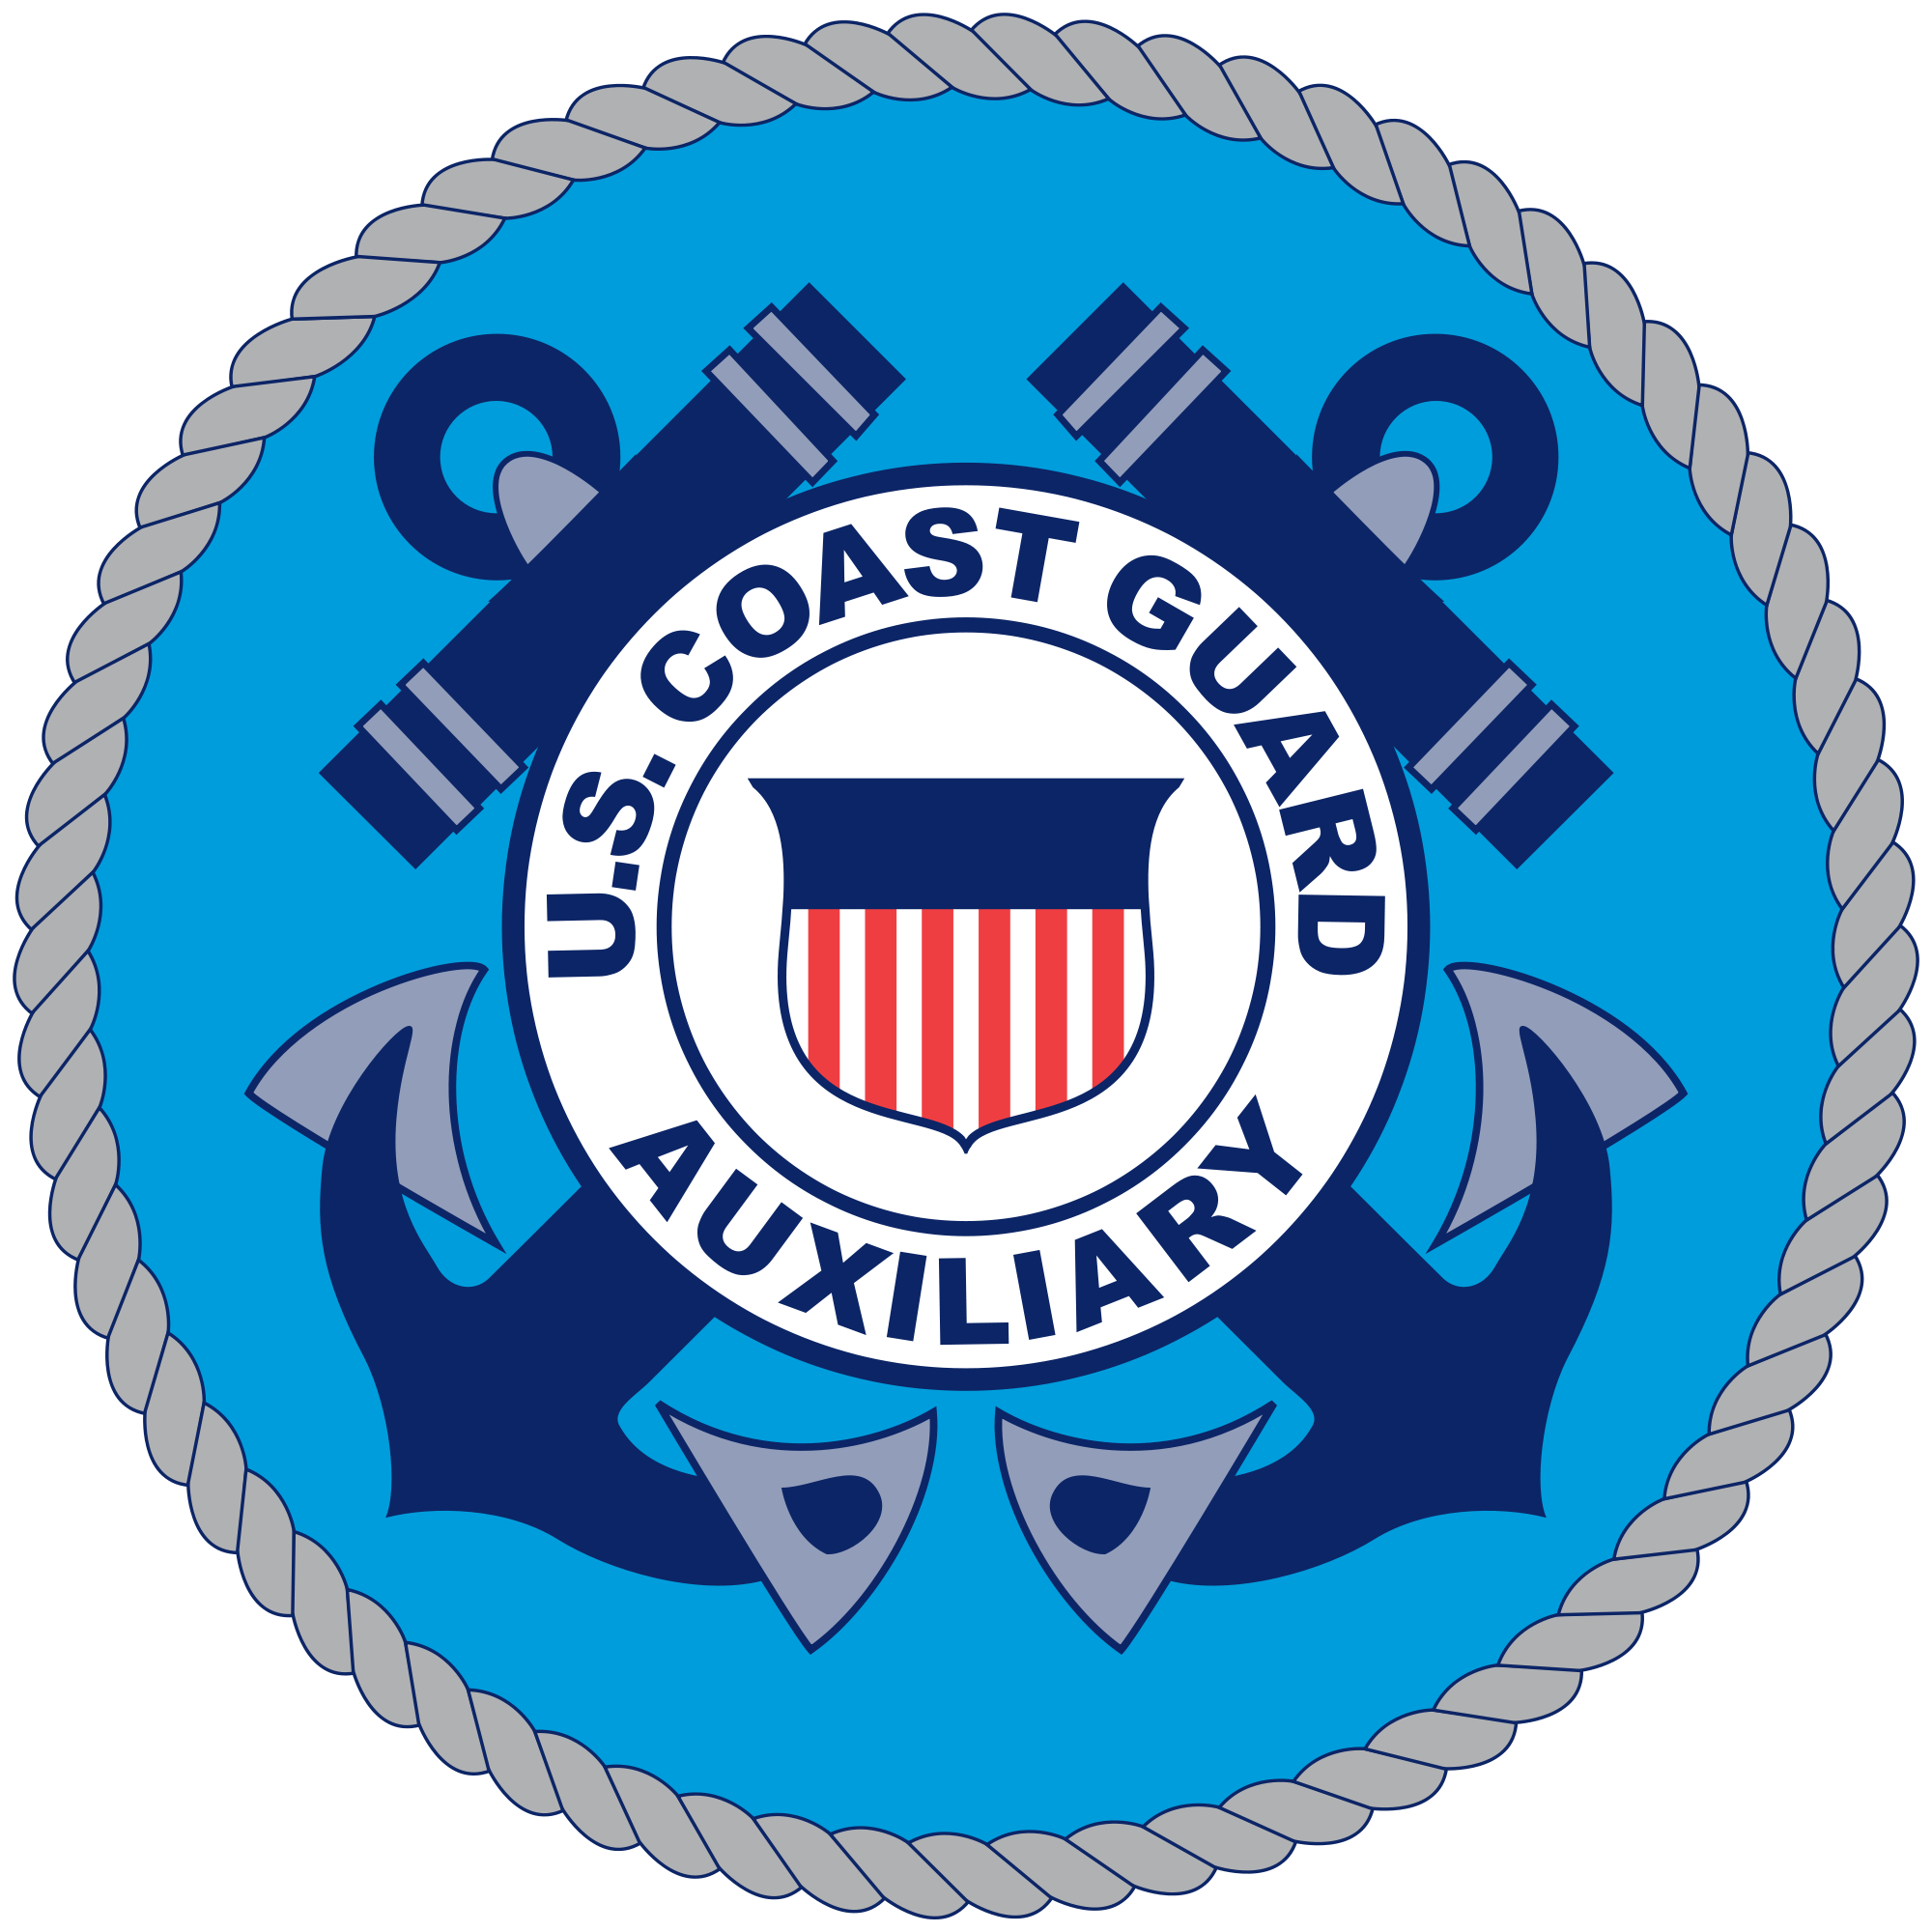 2nd Round Of Us Coast Guard Logo Redesign Coast Guard Logo Coast Guard Us Coast Guard